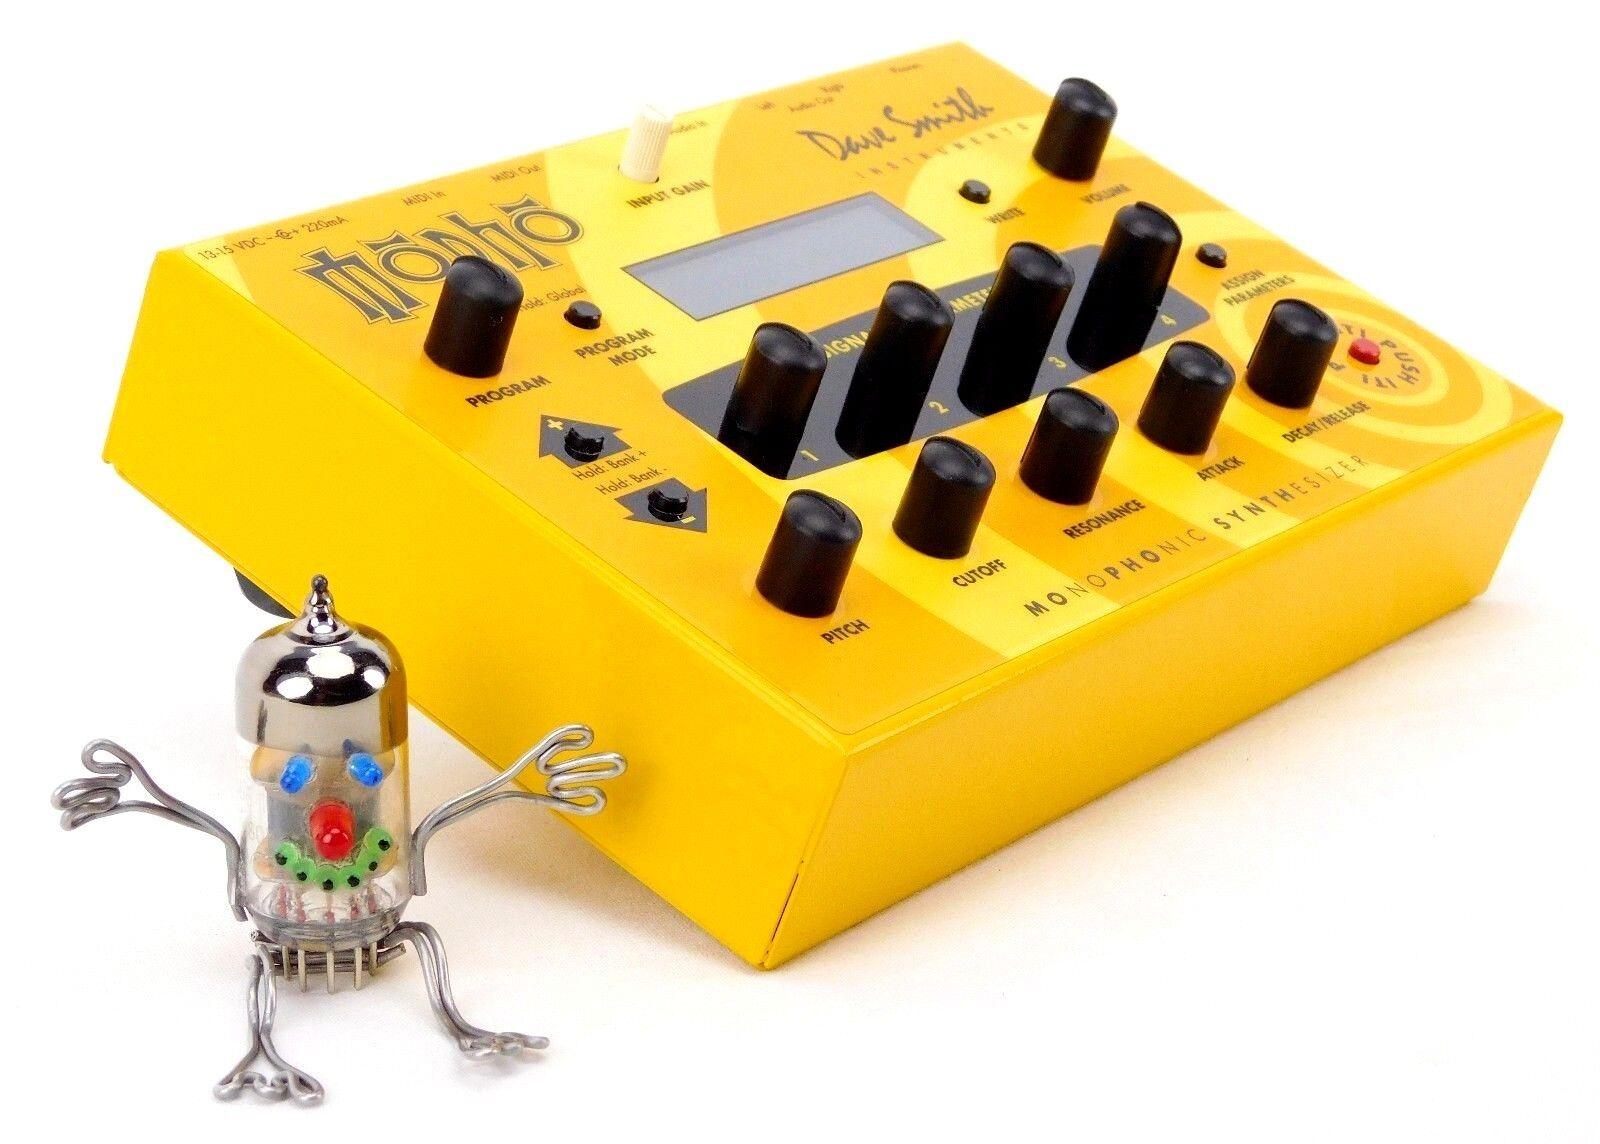 DSI Mopho Dave Smith Instruments Desktop SyntheGrößer + Neuwertig Neuwertig Neuwertig + 1.5J Garantie a28502